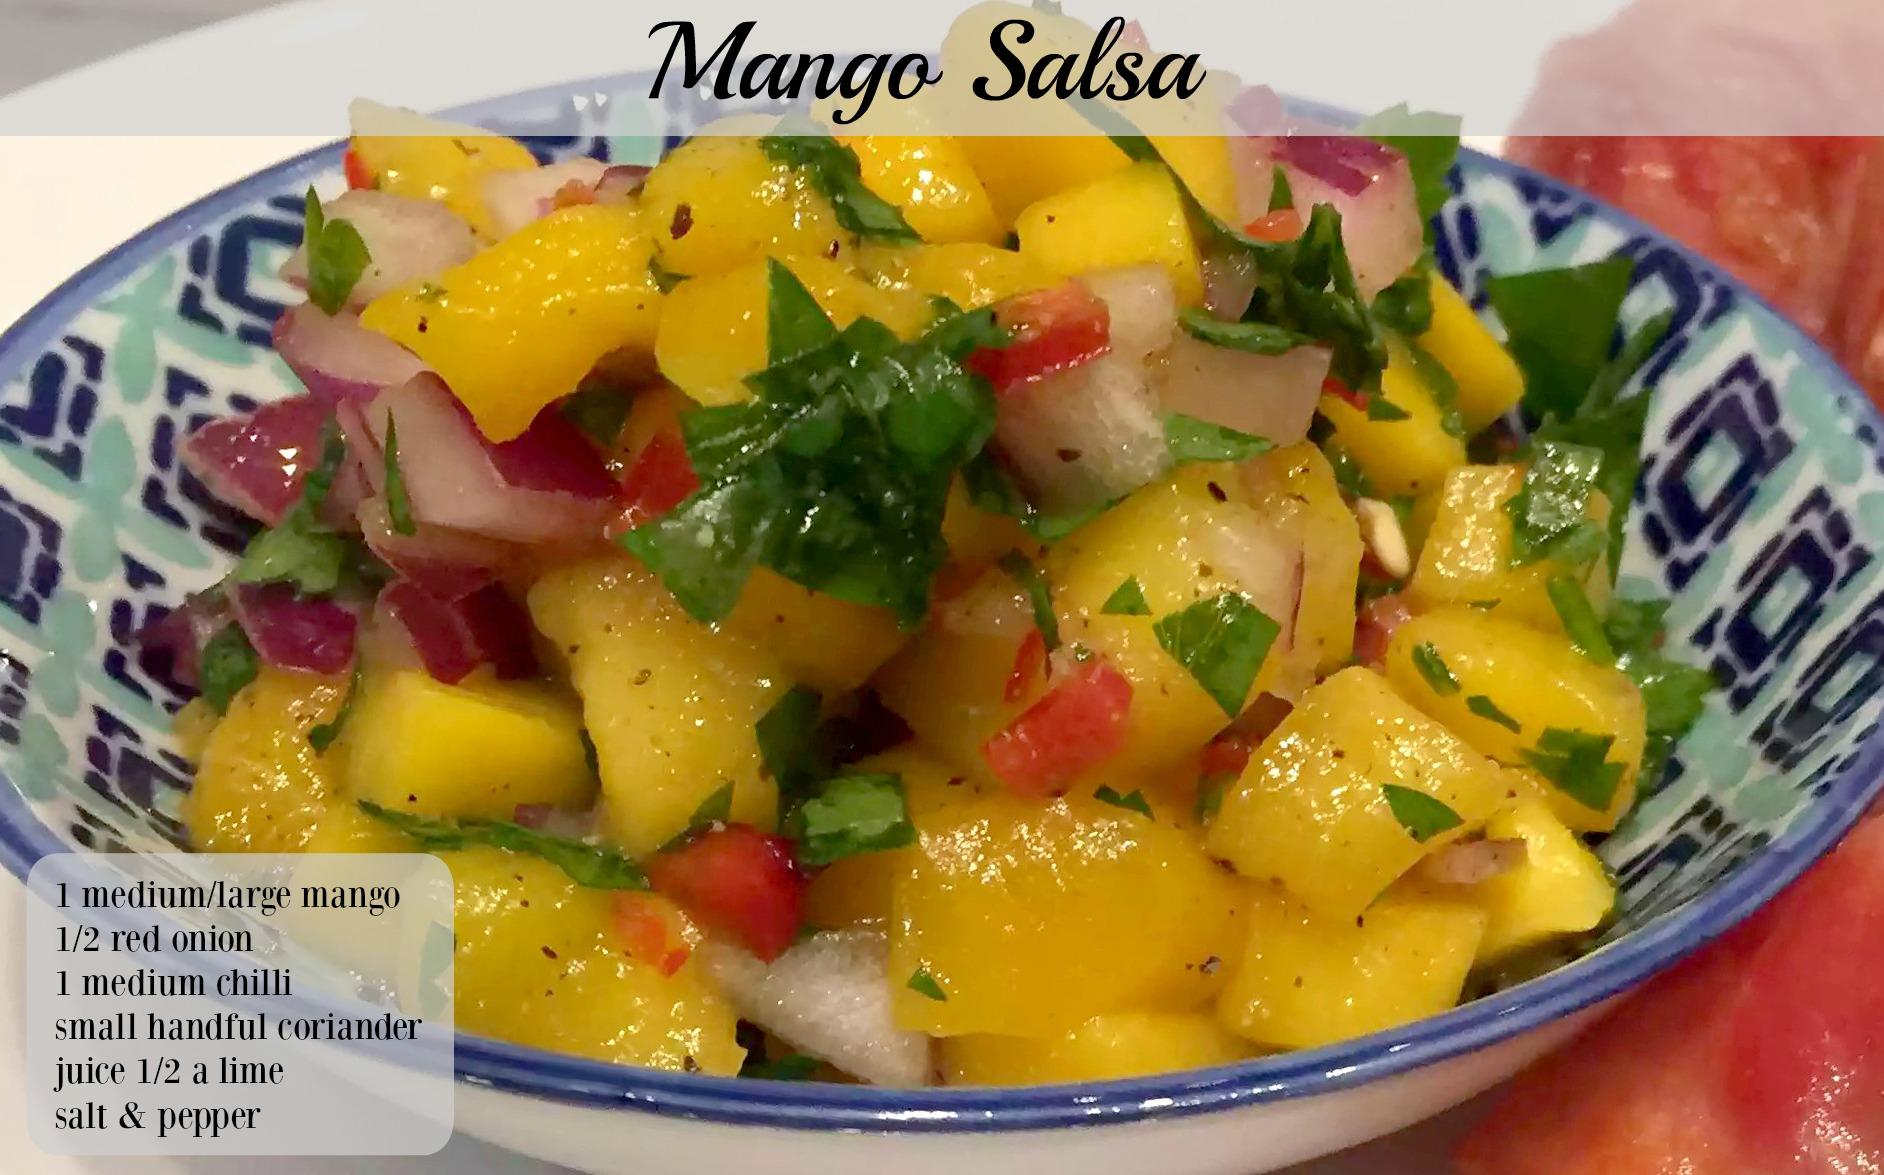 Mango Salsa Paleo SCD Gluten-Free Grain-Free Dairy-Free Sugar-Free Onion Chilli Coriander